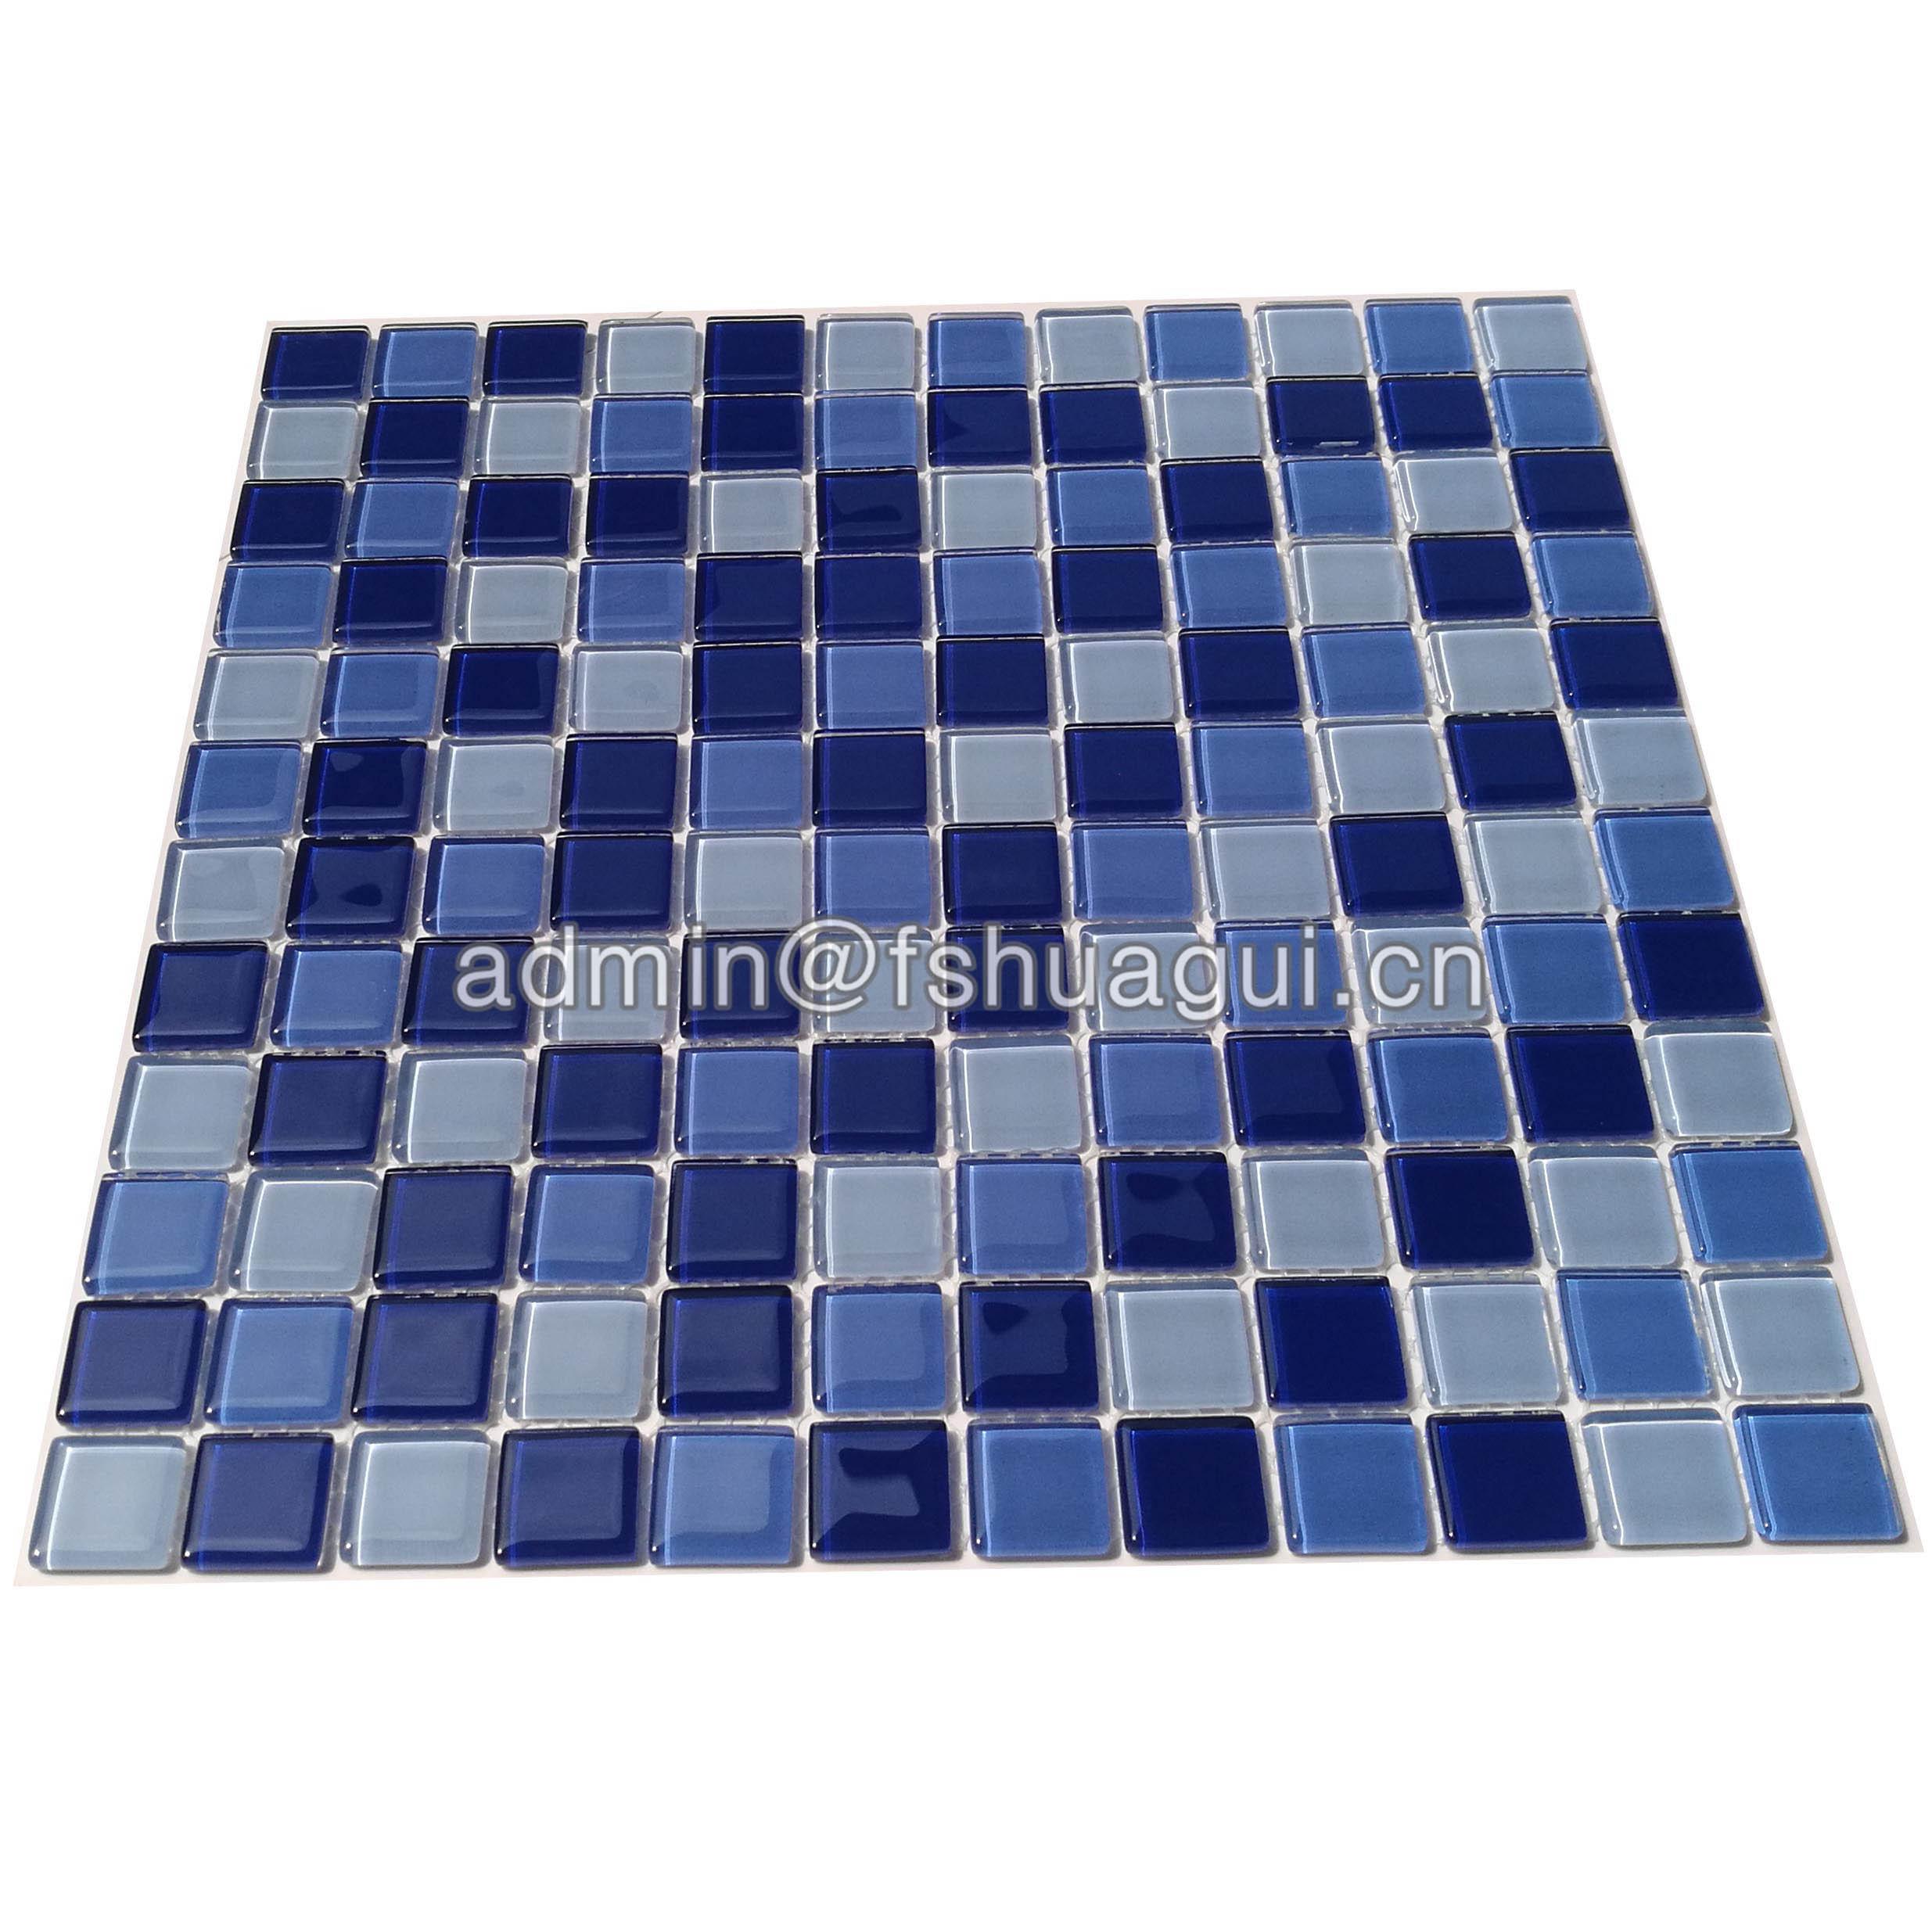 Huagui Popular blue ocean glass mosaic swimming pool tile Florida  HG-423010 GLASS MOSAIC TILE image3